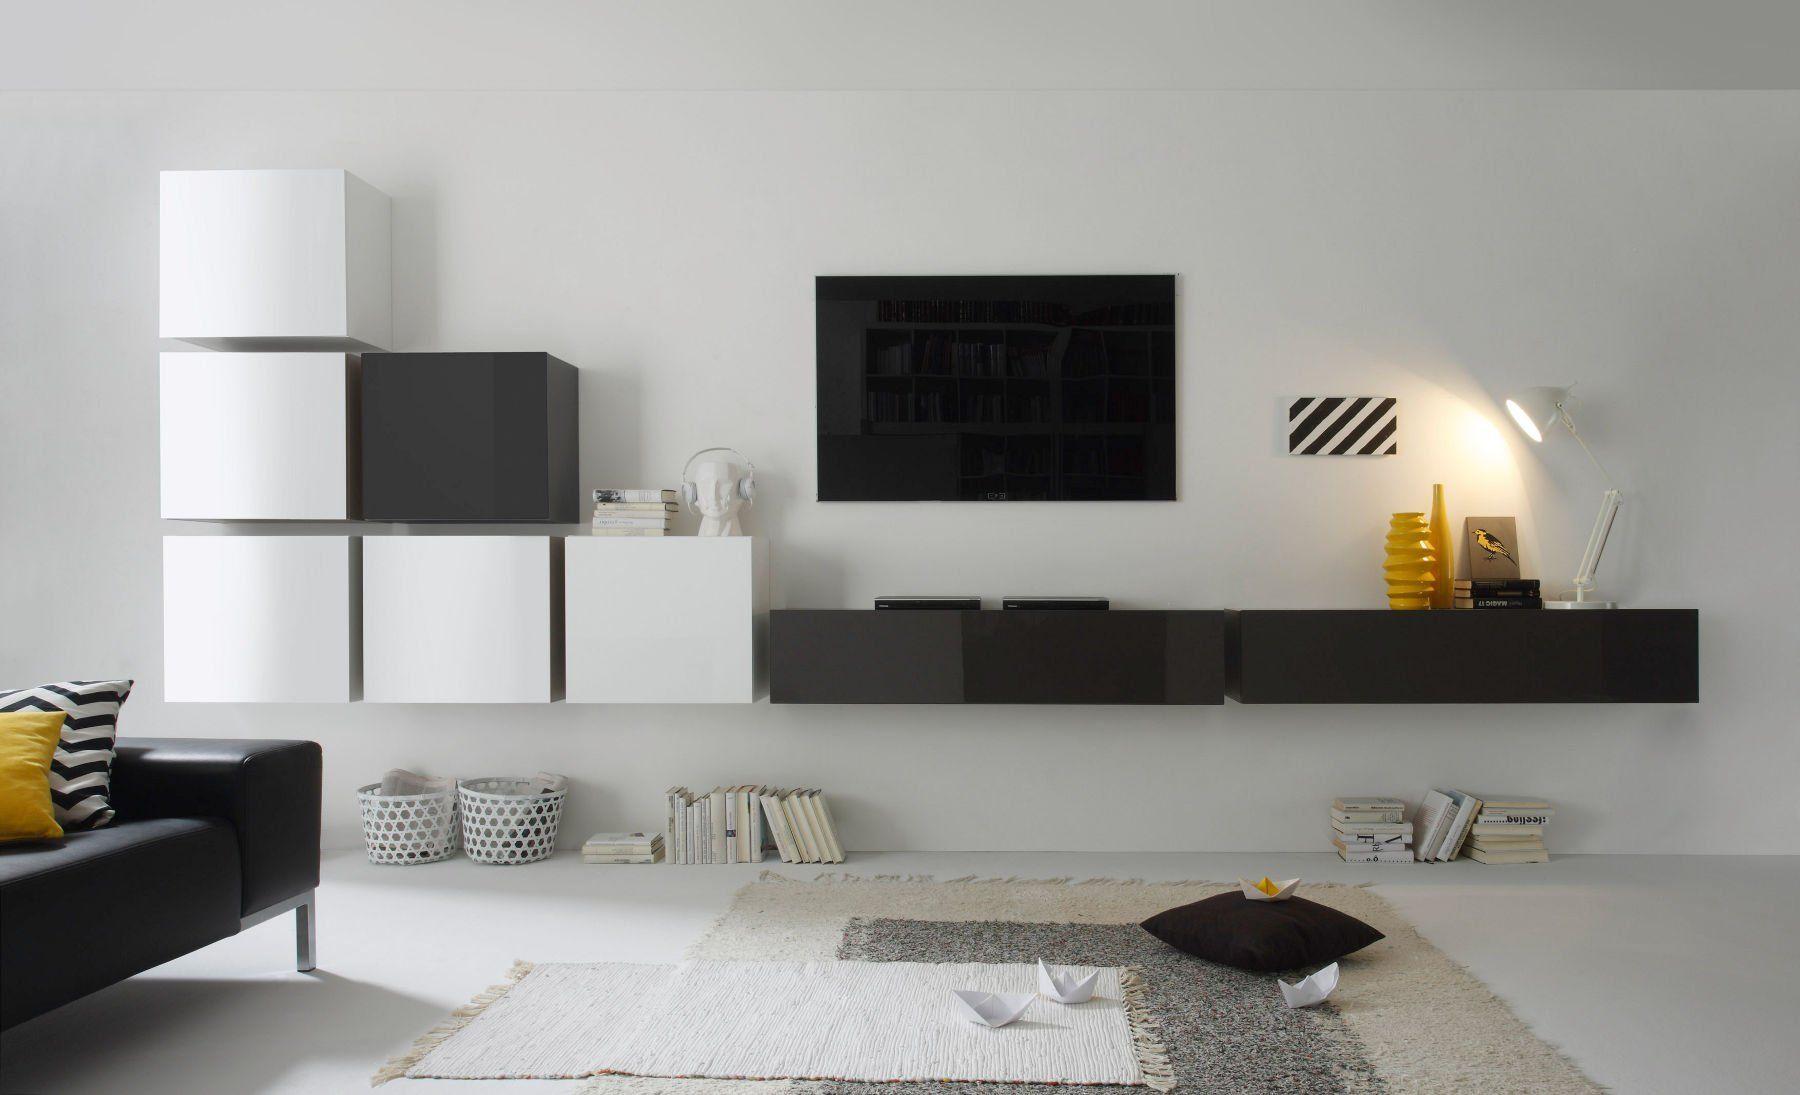 Wohnwand Italian Design In 2020 Modern Living Room Wall